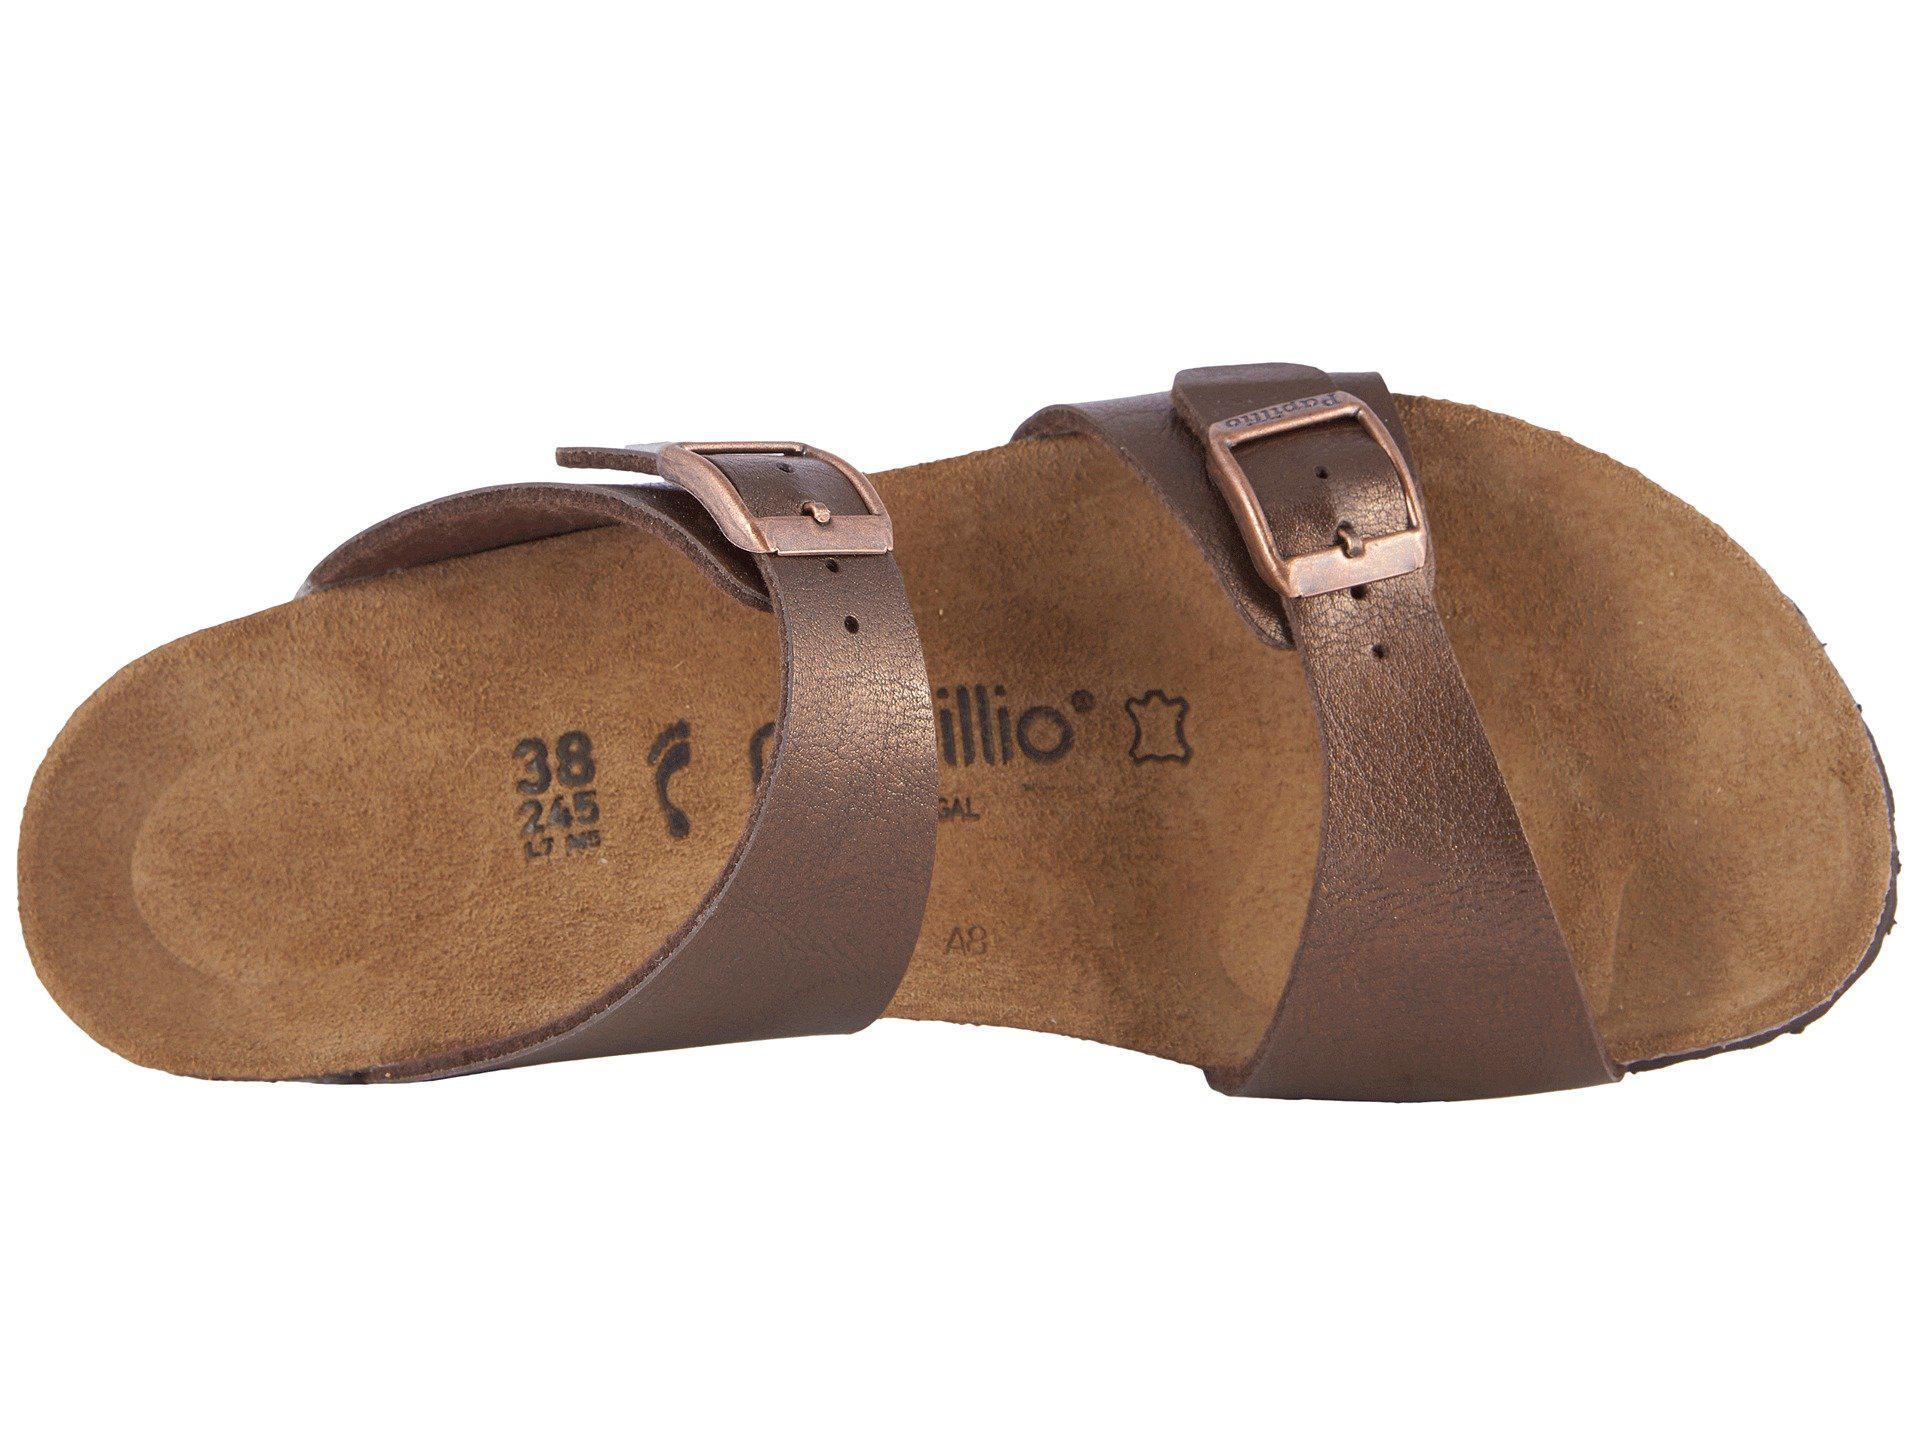 8cd812dd7c ... (graceful Licorice Birko-flortm) Women s Sandals - Lyst. View fullscreen